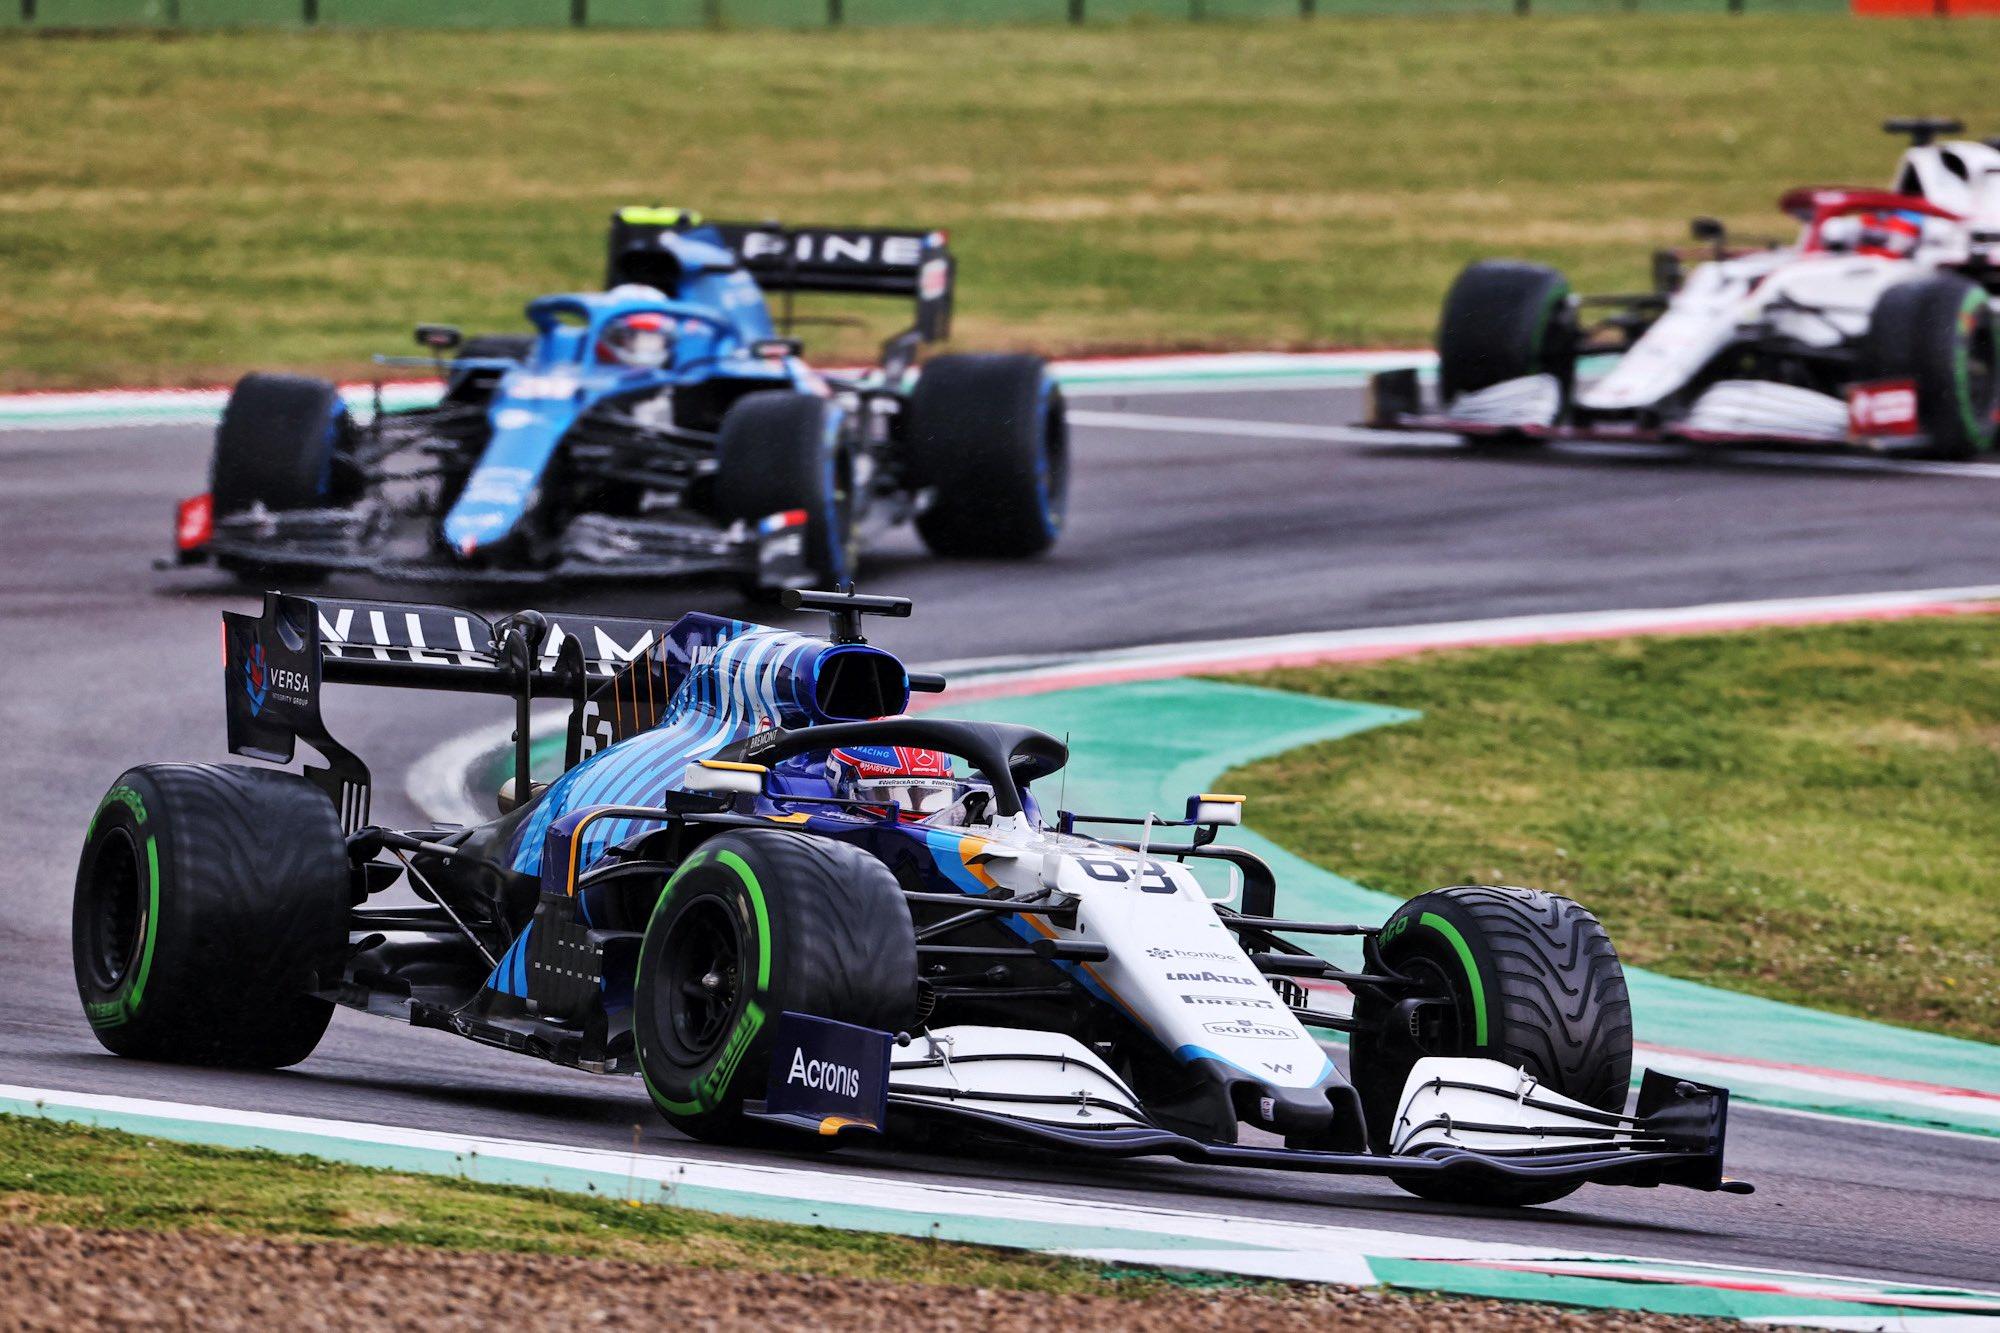 Russell impliqué dans un gros accident avec Bottas © Williams F1